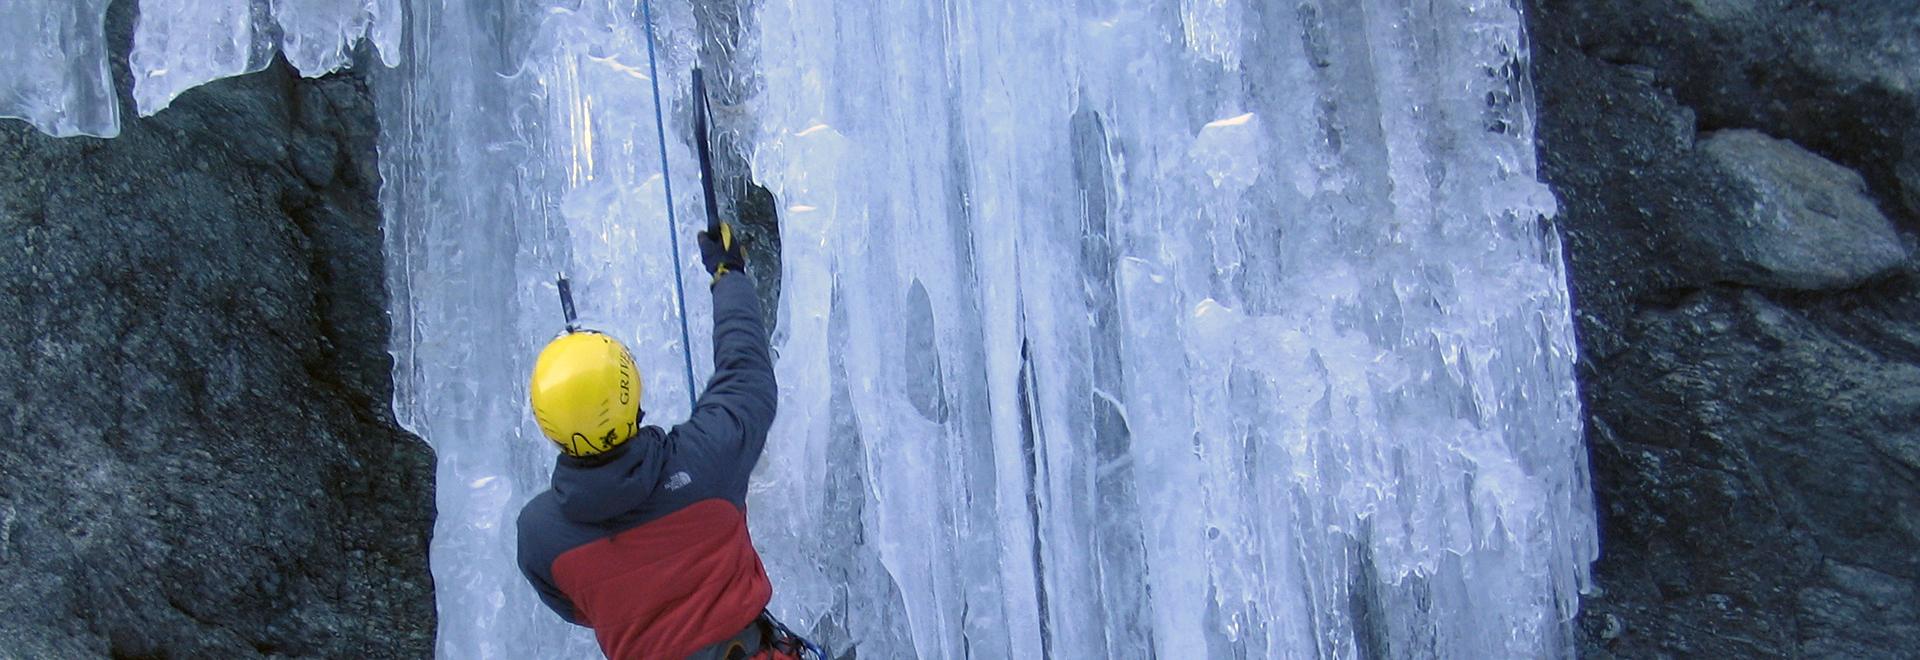 Ice-climbing – Advanced training module